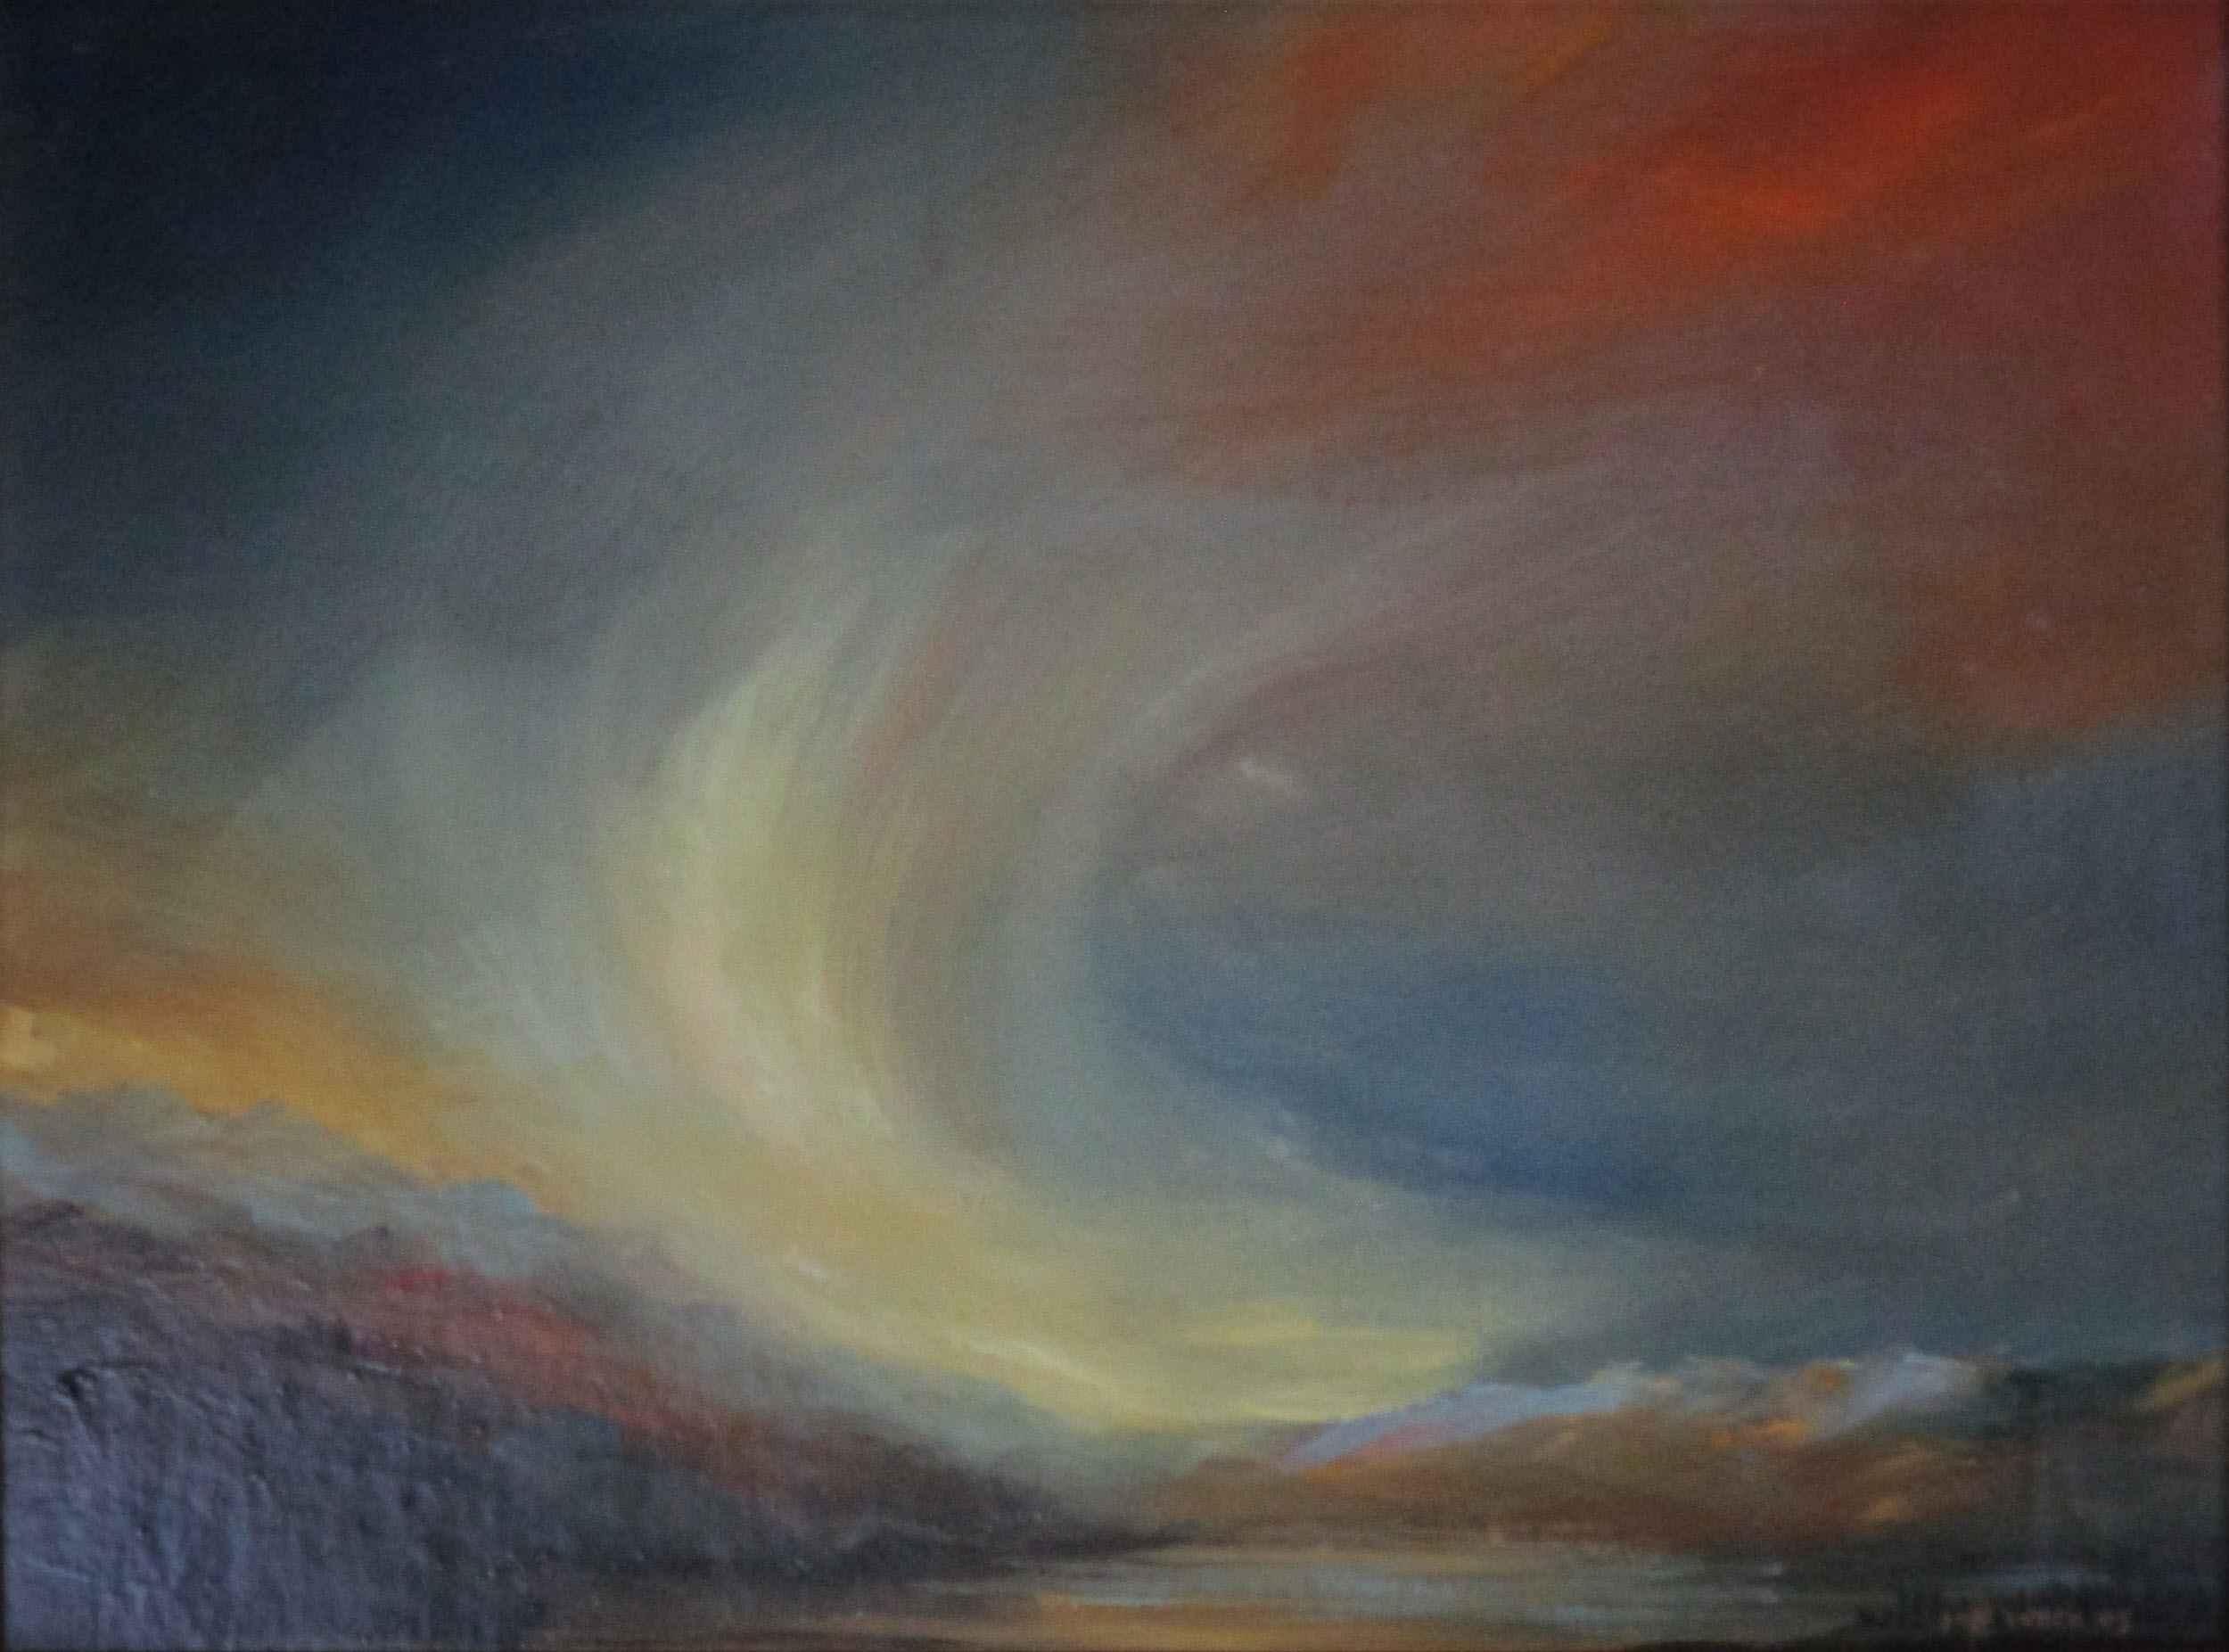 Twilight Sky by  Jeff White - Masterpiece Online